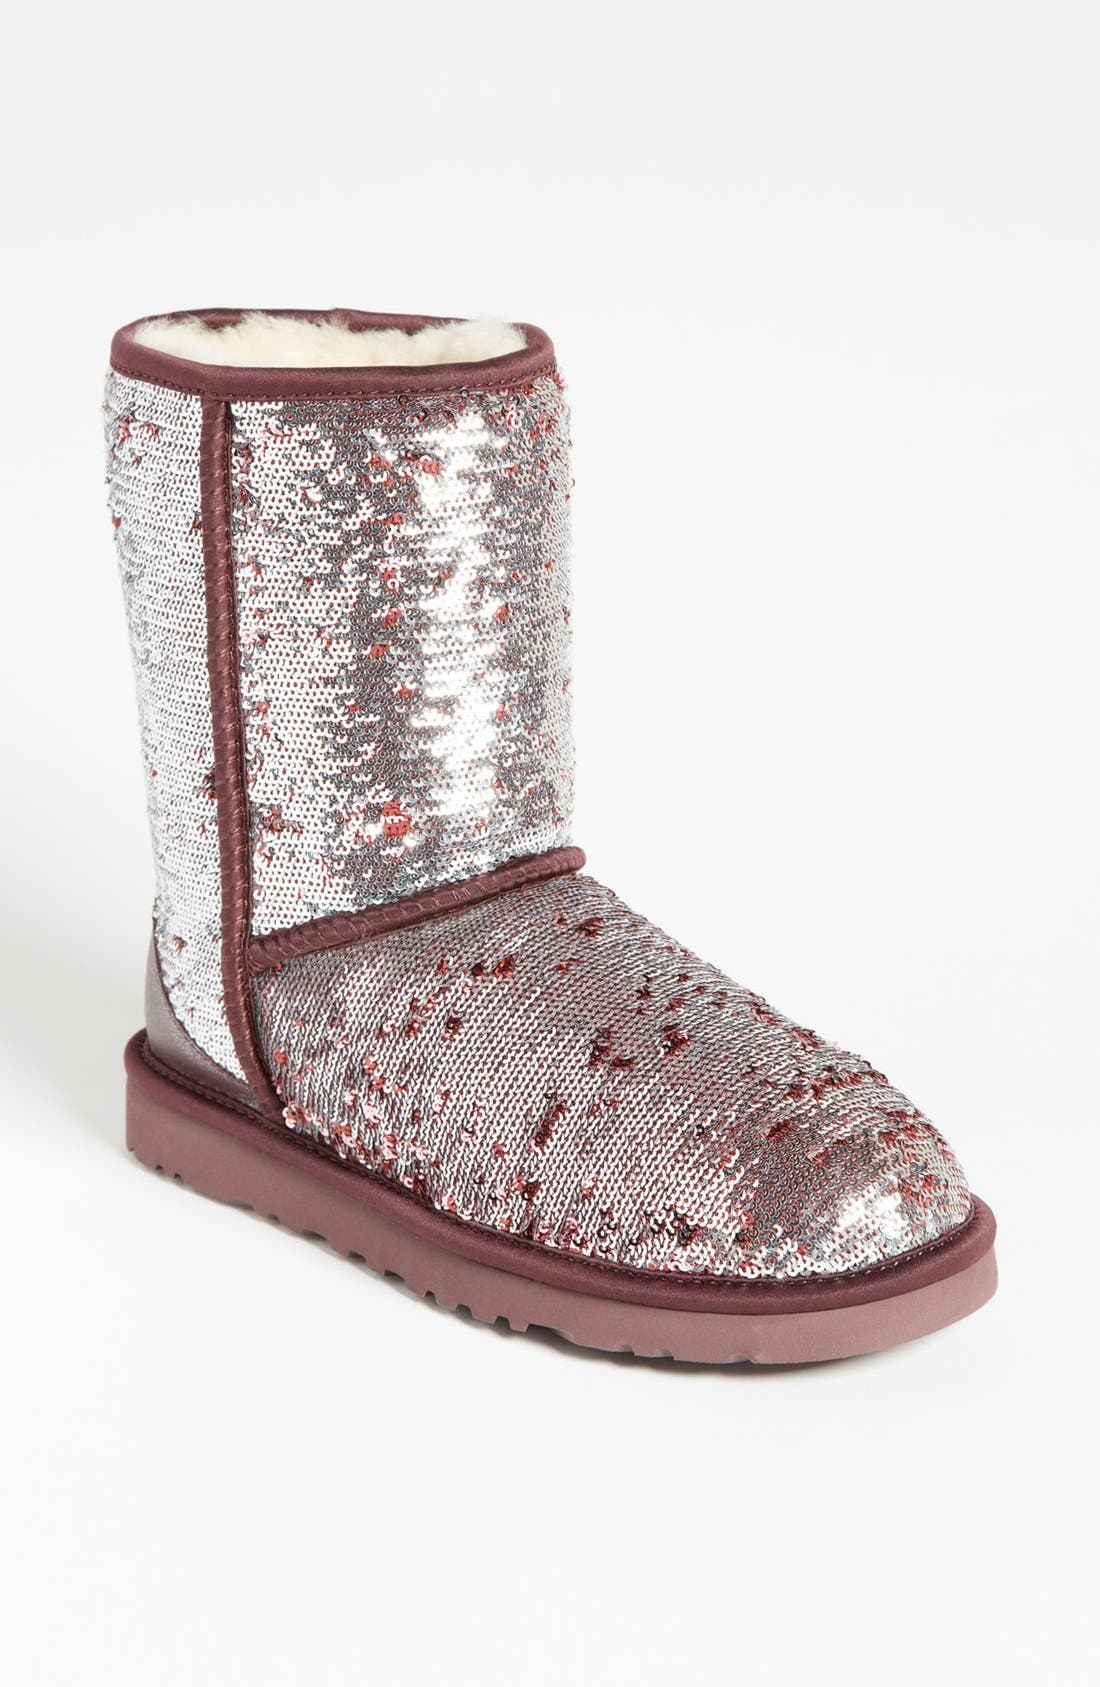 Main Image - UGG® Australia 'Classic Short Sparkle' Boot (Women)